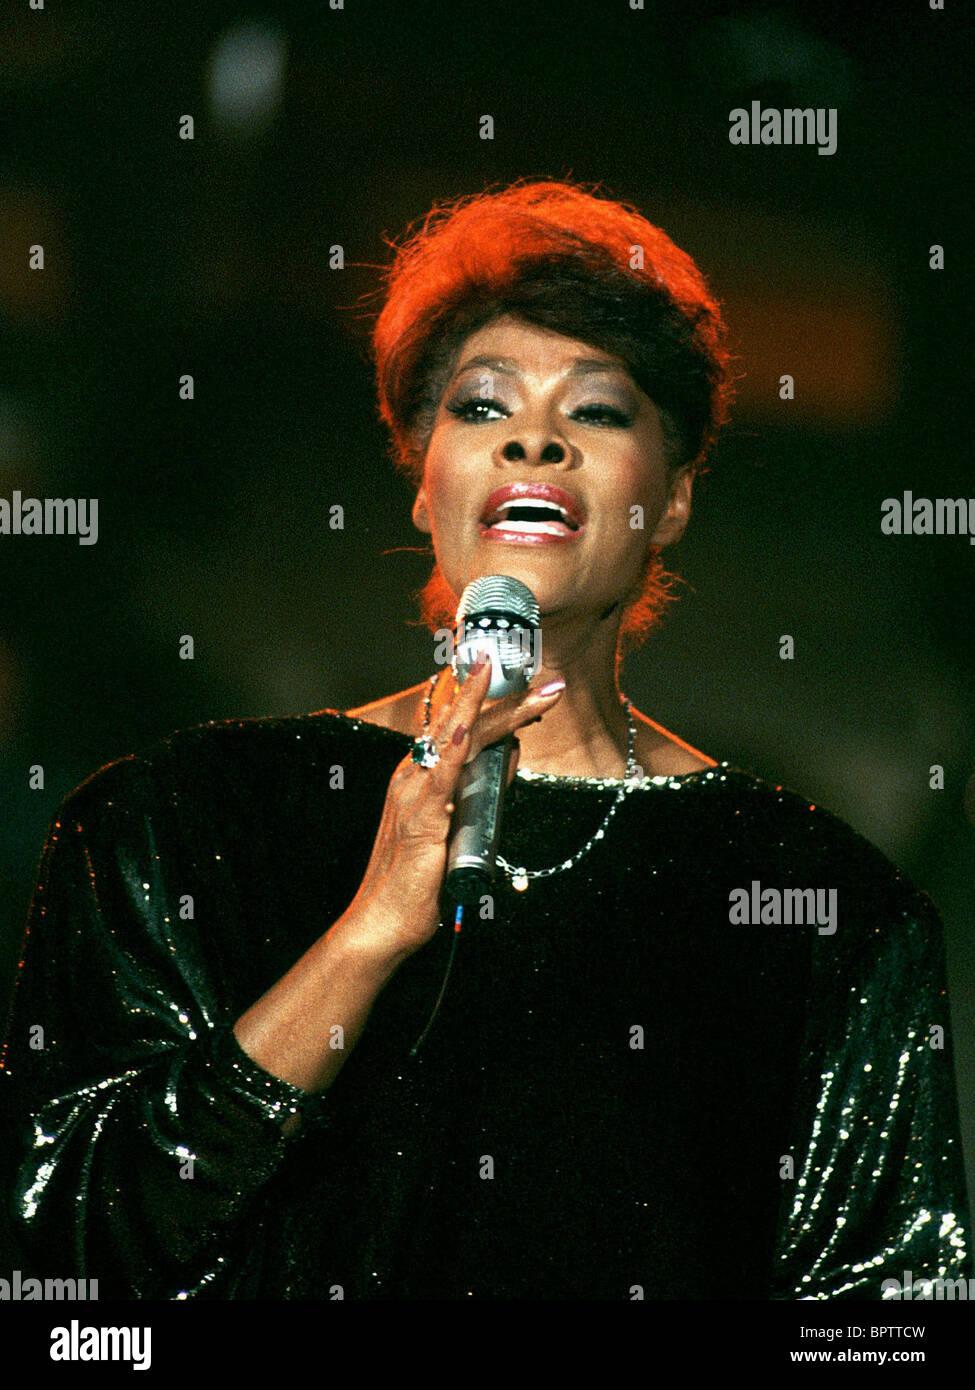 DIONNE WARWICK SINGER (1989) - Stock Image